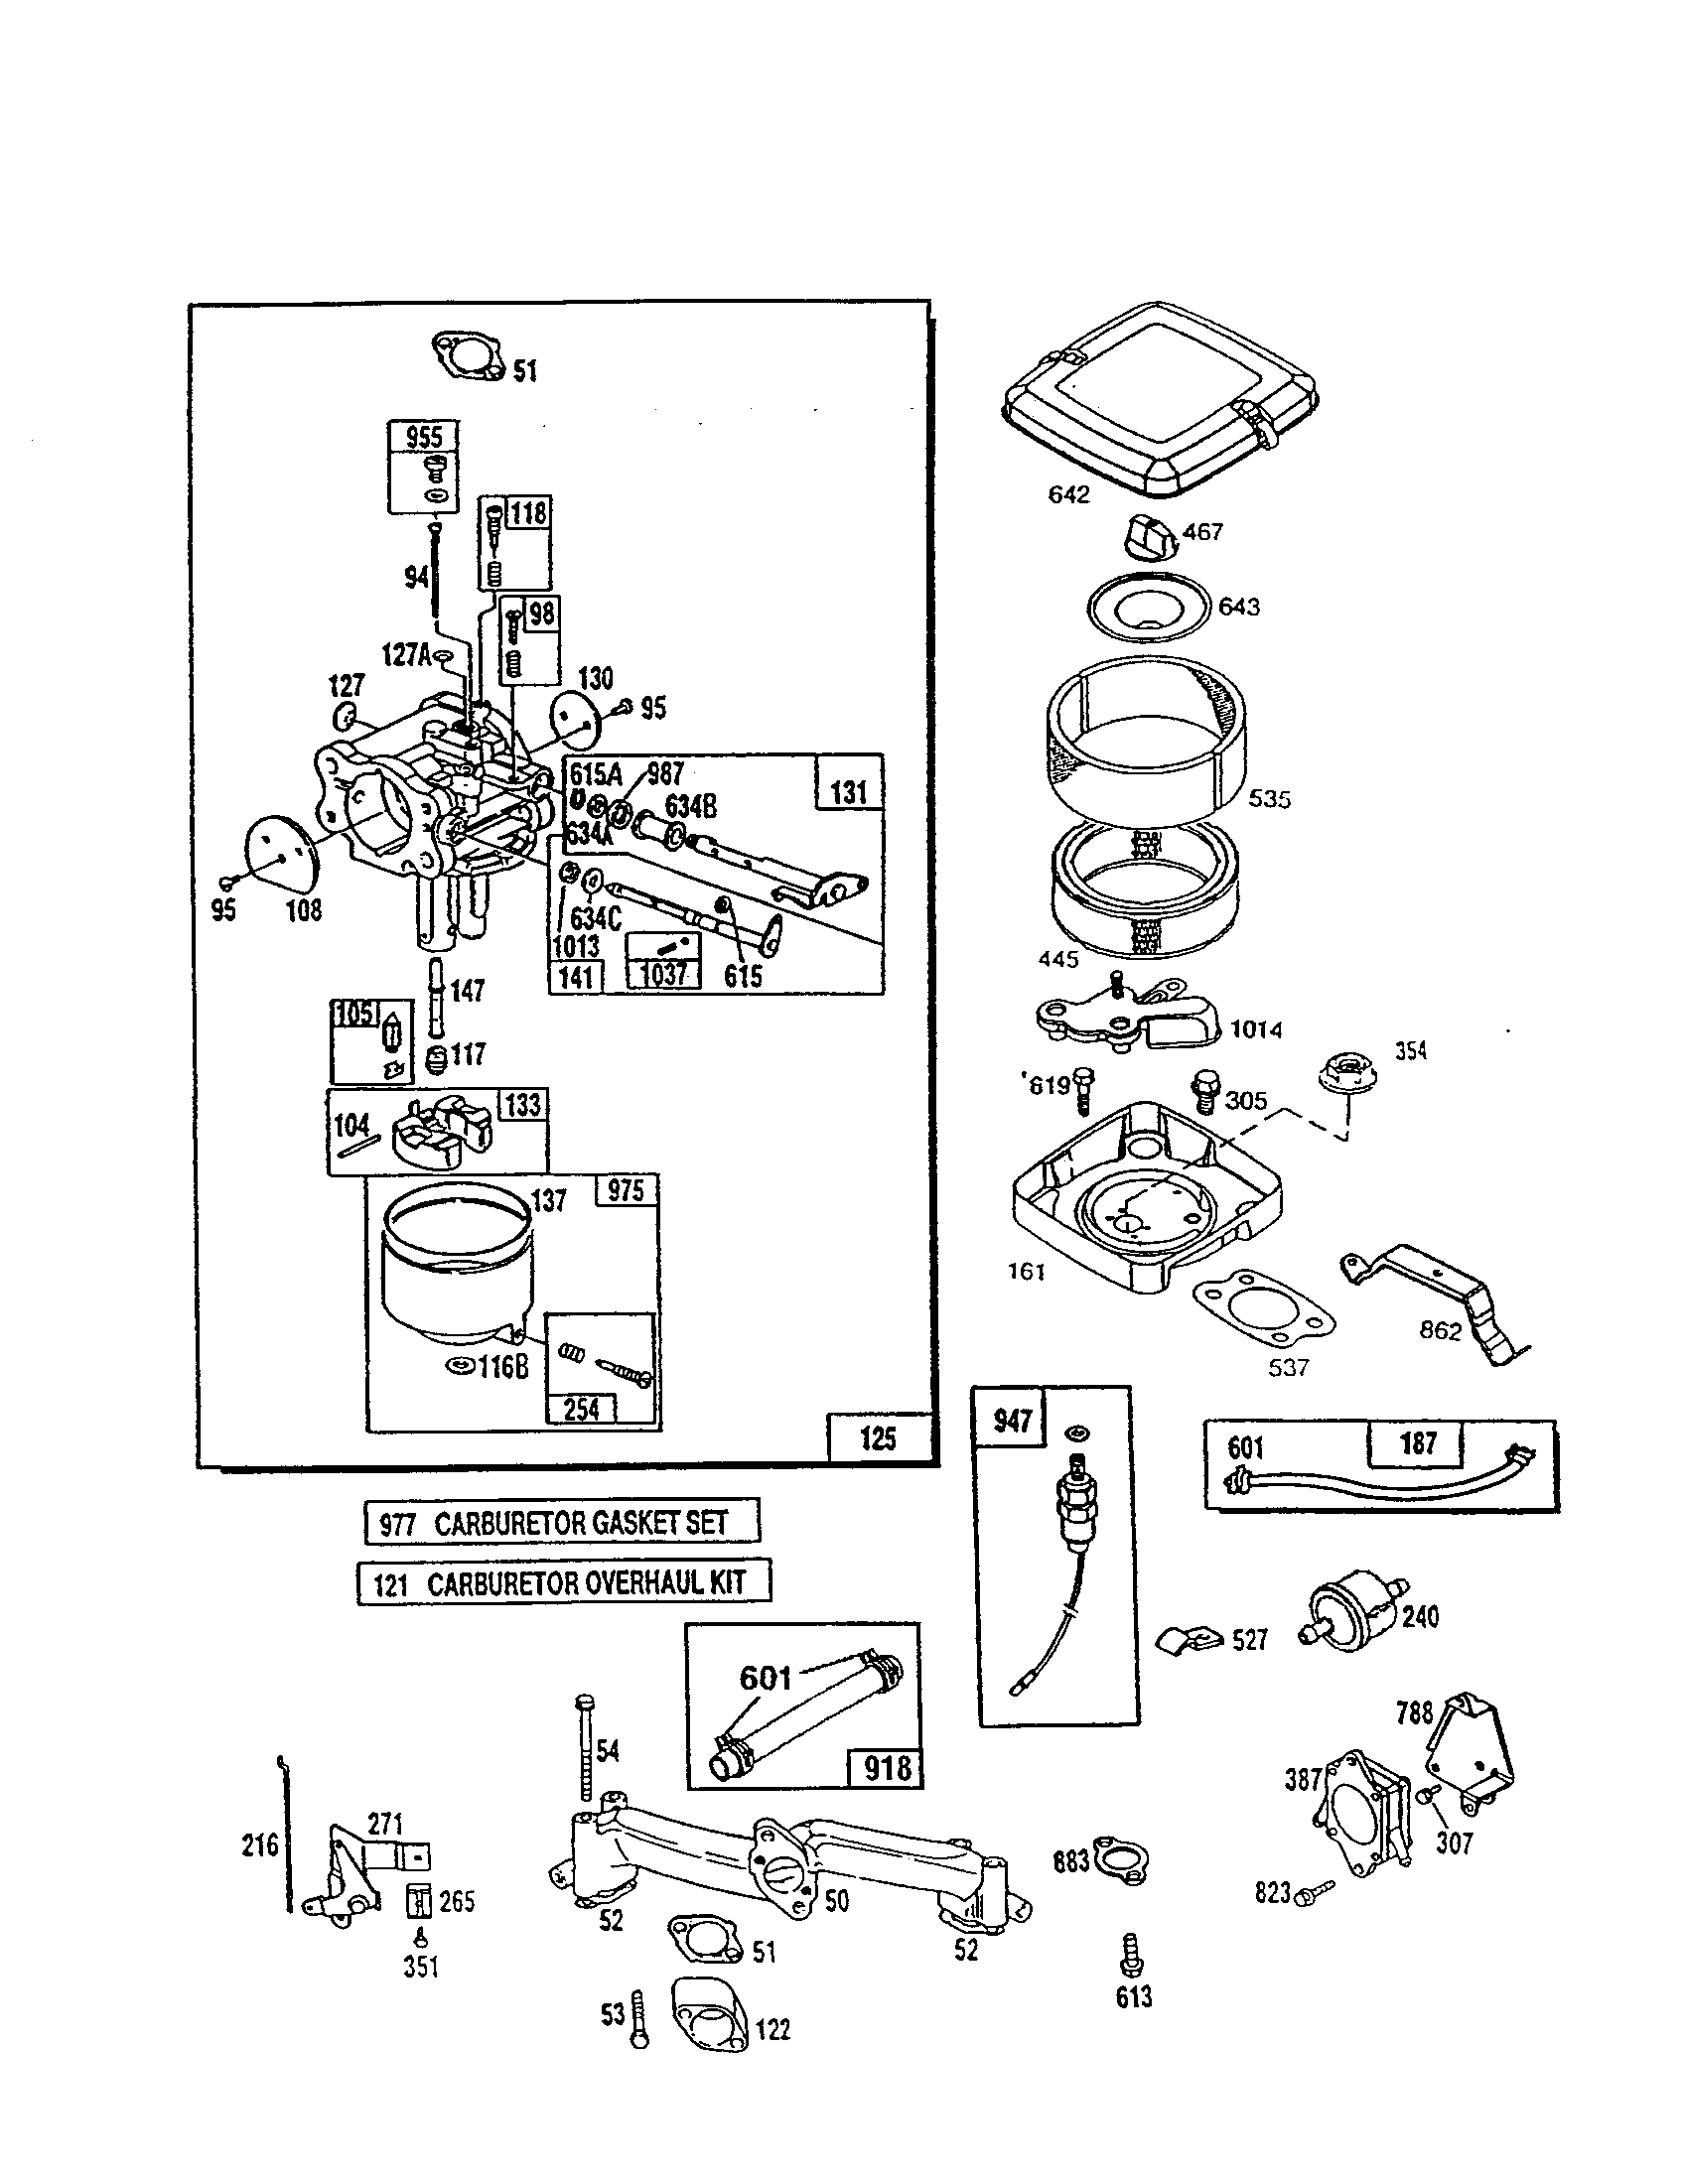 Teletouch Transmission Single Dual Range Wiring Diagram